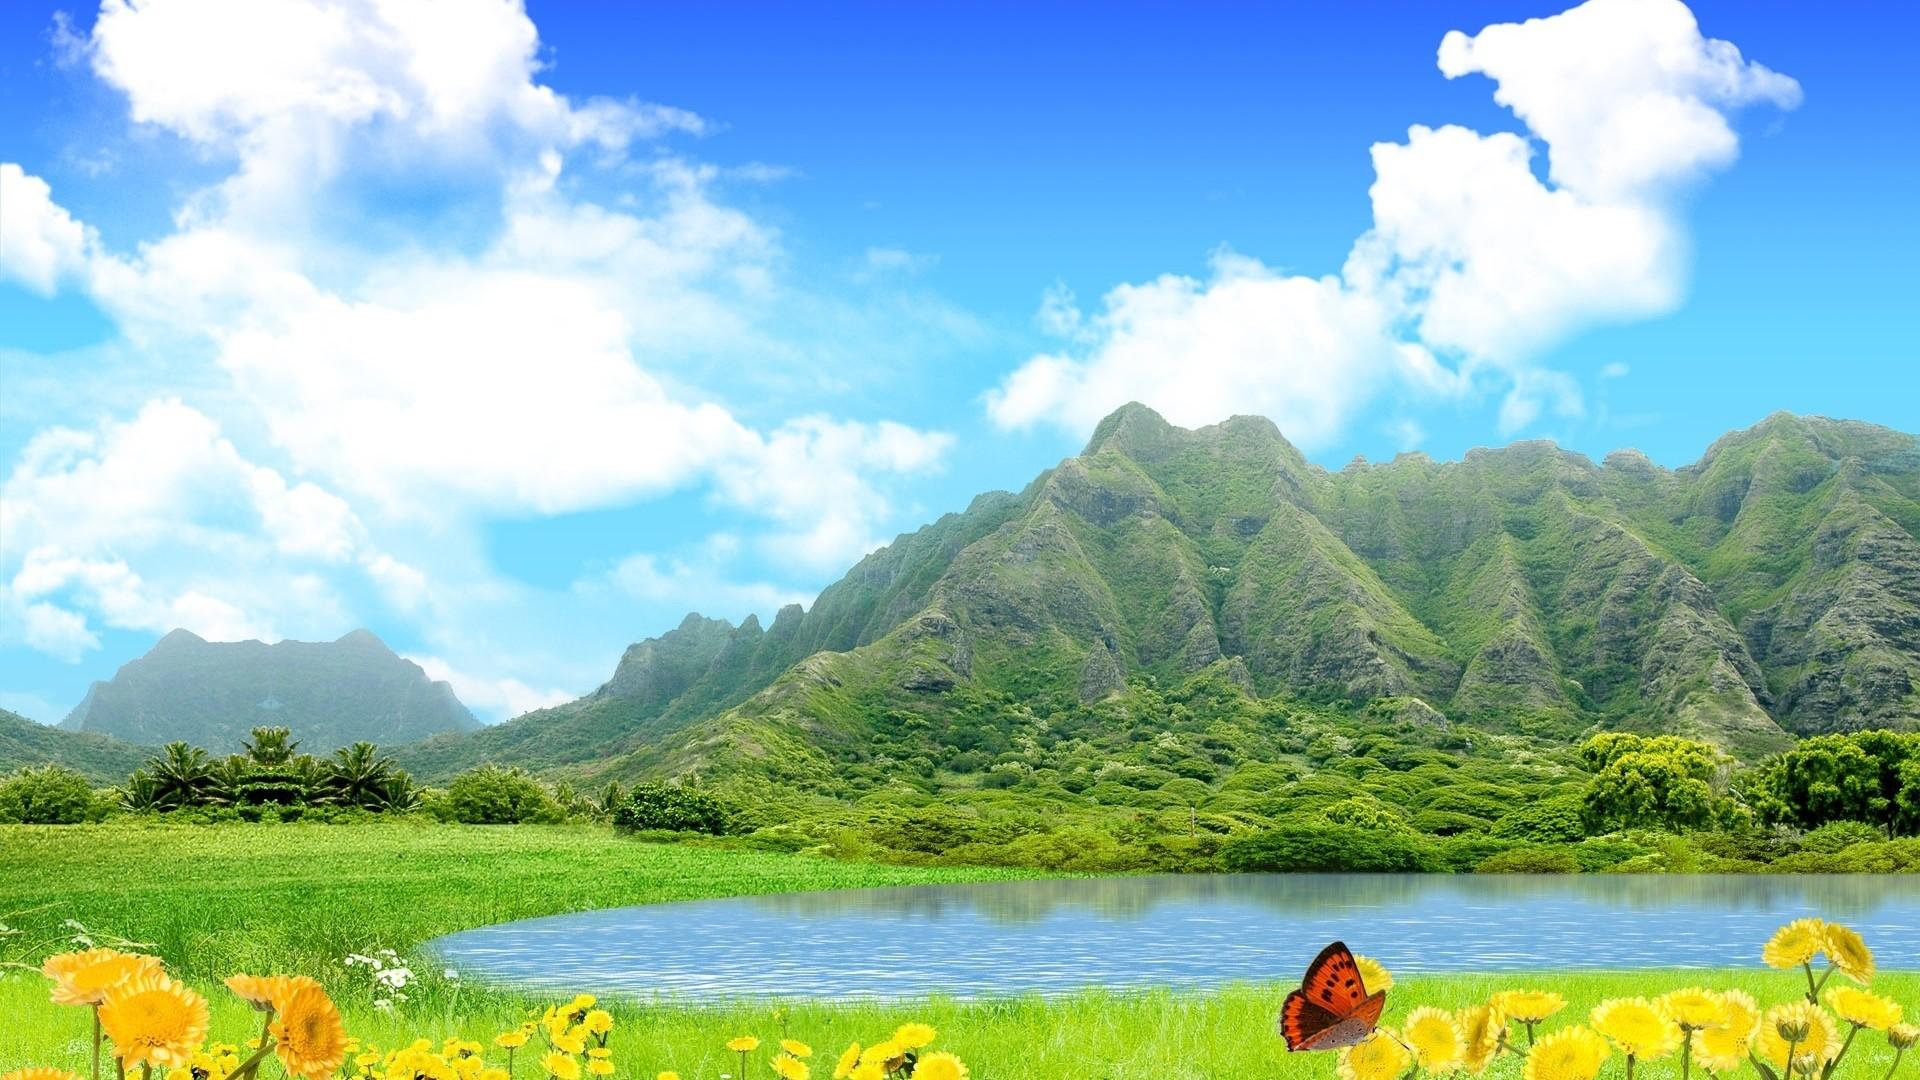 Wallpaper mountains, lake, sky, flowers, butterfly, summer